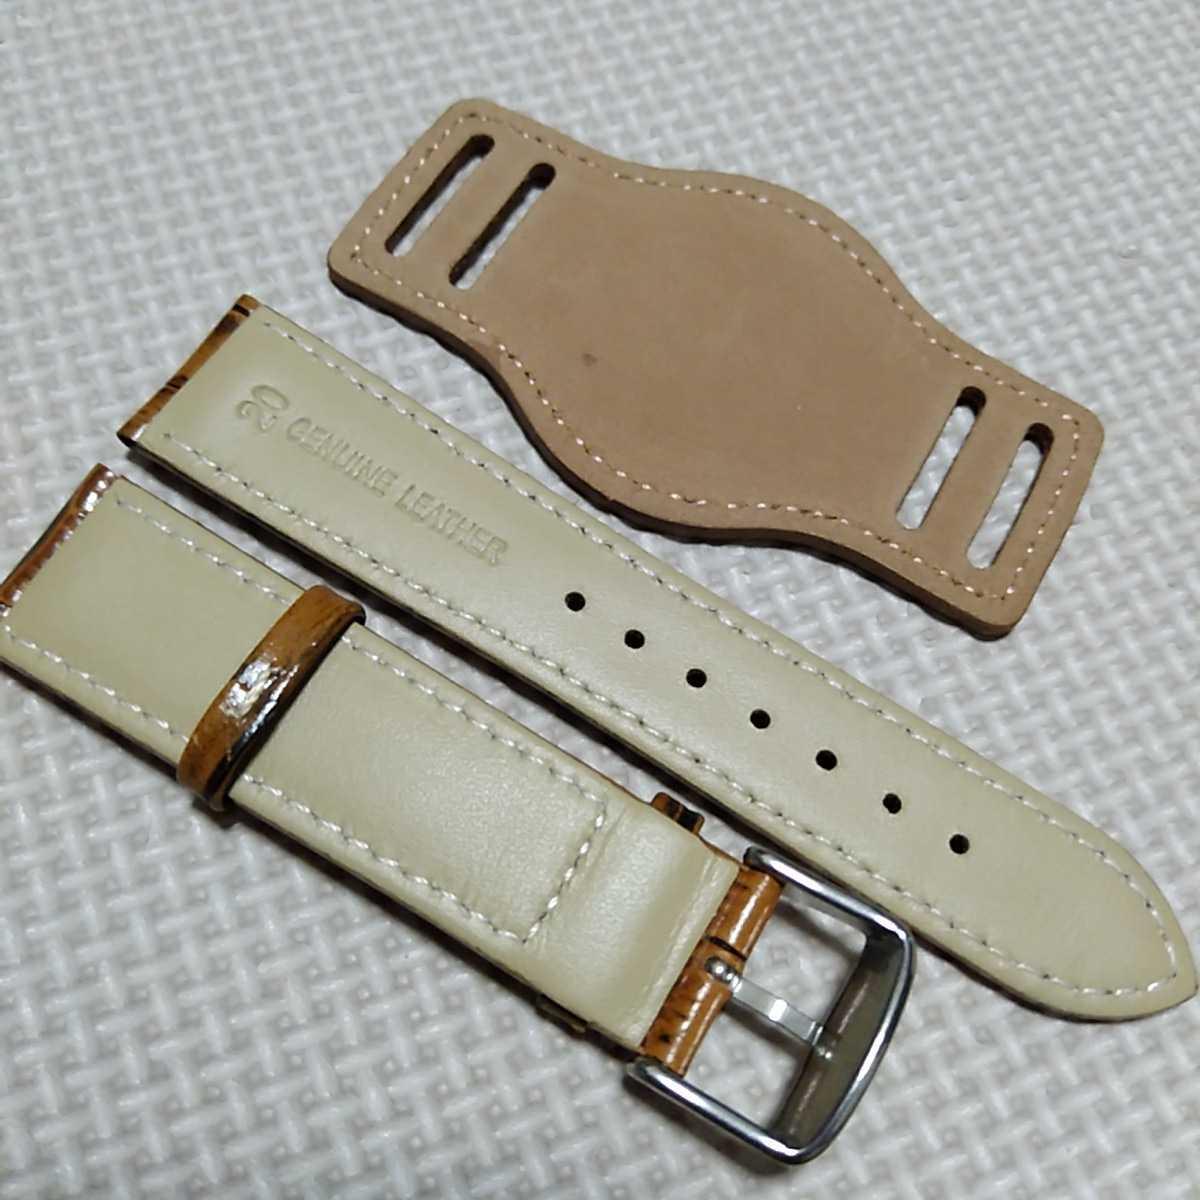 No55 ブンド BUND 本革レザーベルト 腕時計ベルト 交換用ストラップ ブラウン クロコ型押し 20mm 未使用 高品質 ドイツパイロット 空軍_画像4